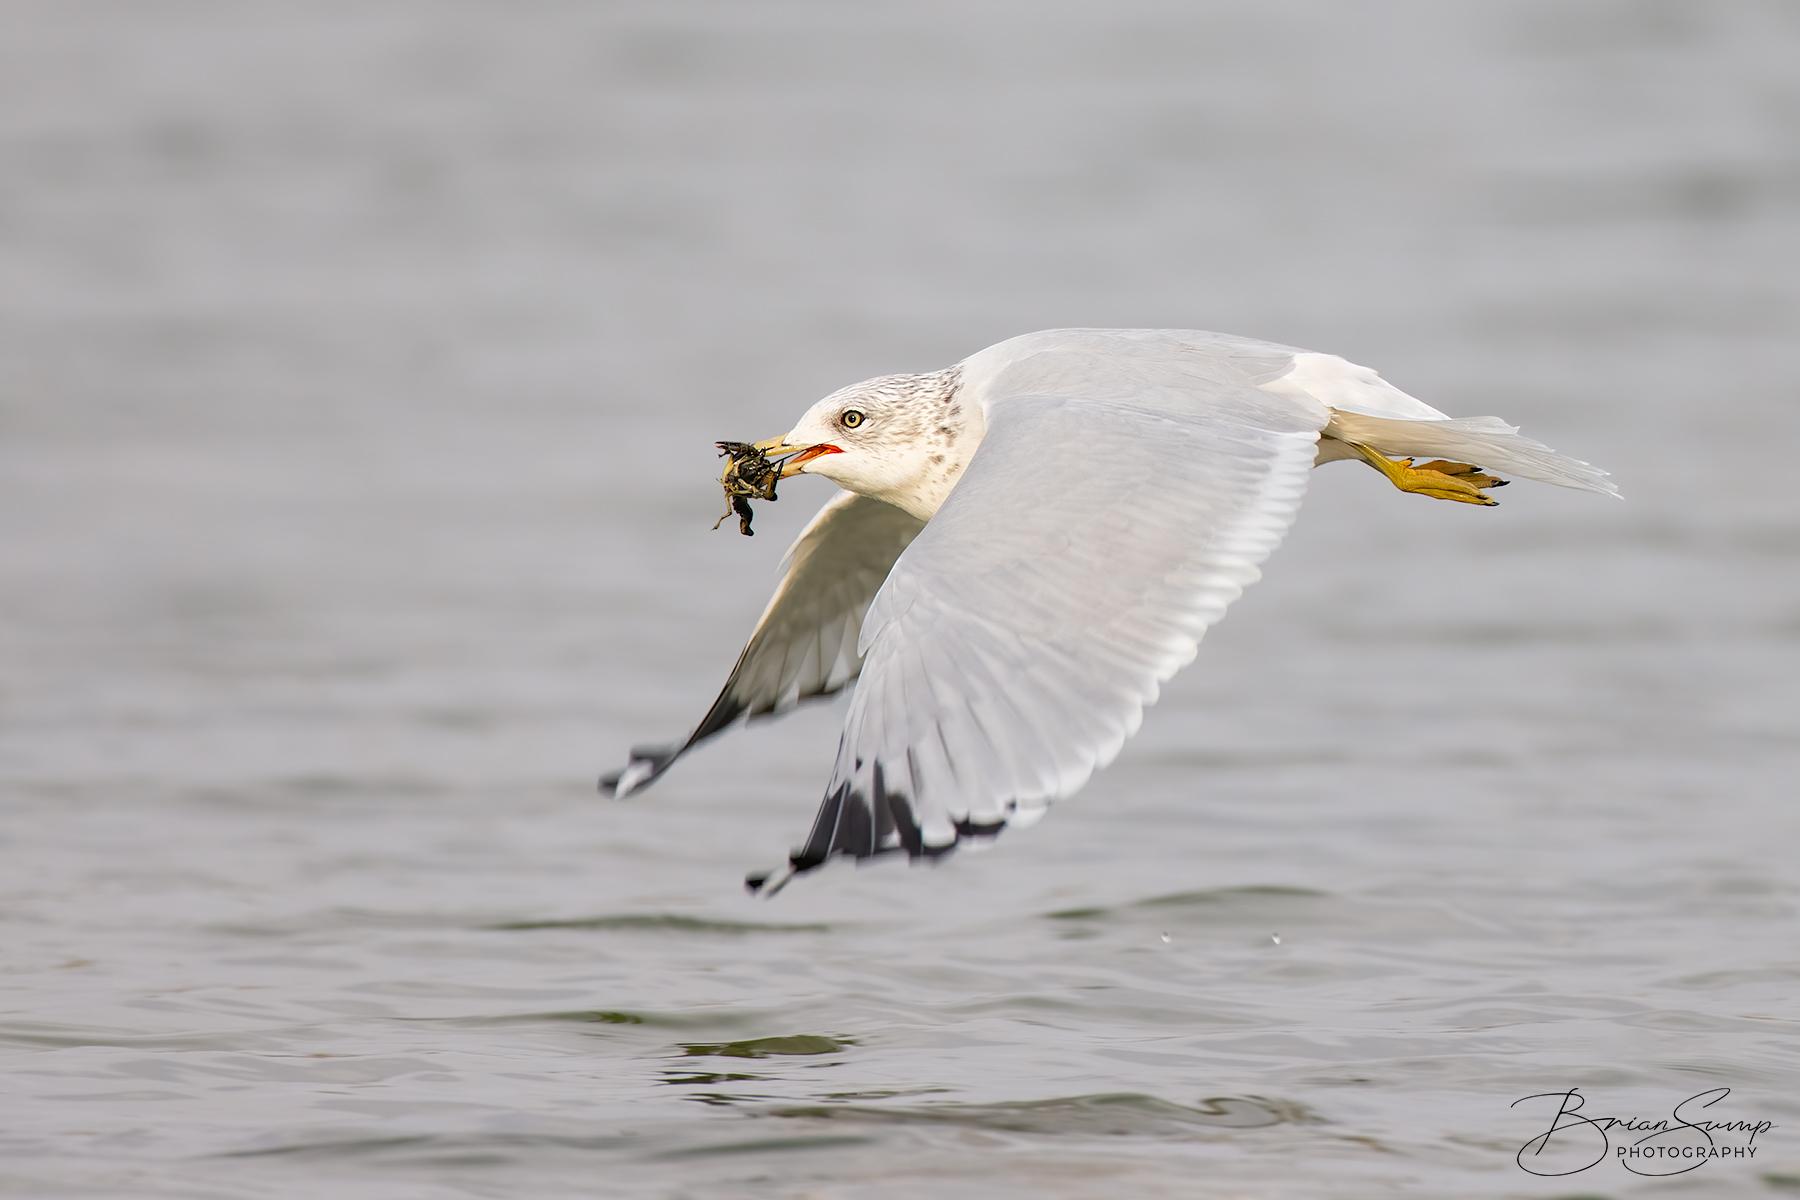 Name:  20201020-Gull-crawdad-wingsdown-Brian-Sump-BMS_9533-2-FORUM-SIG-USM170-touch-craw.jpg Views: 158 Size:  518.7 KB